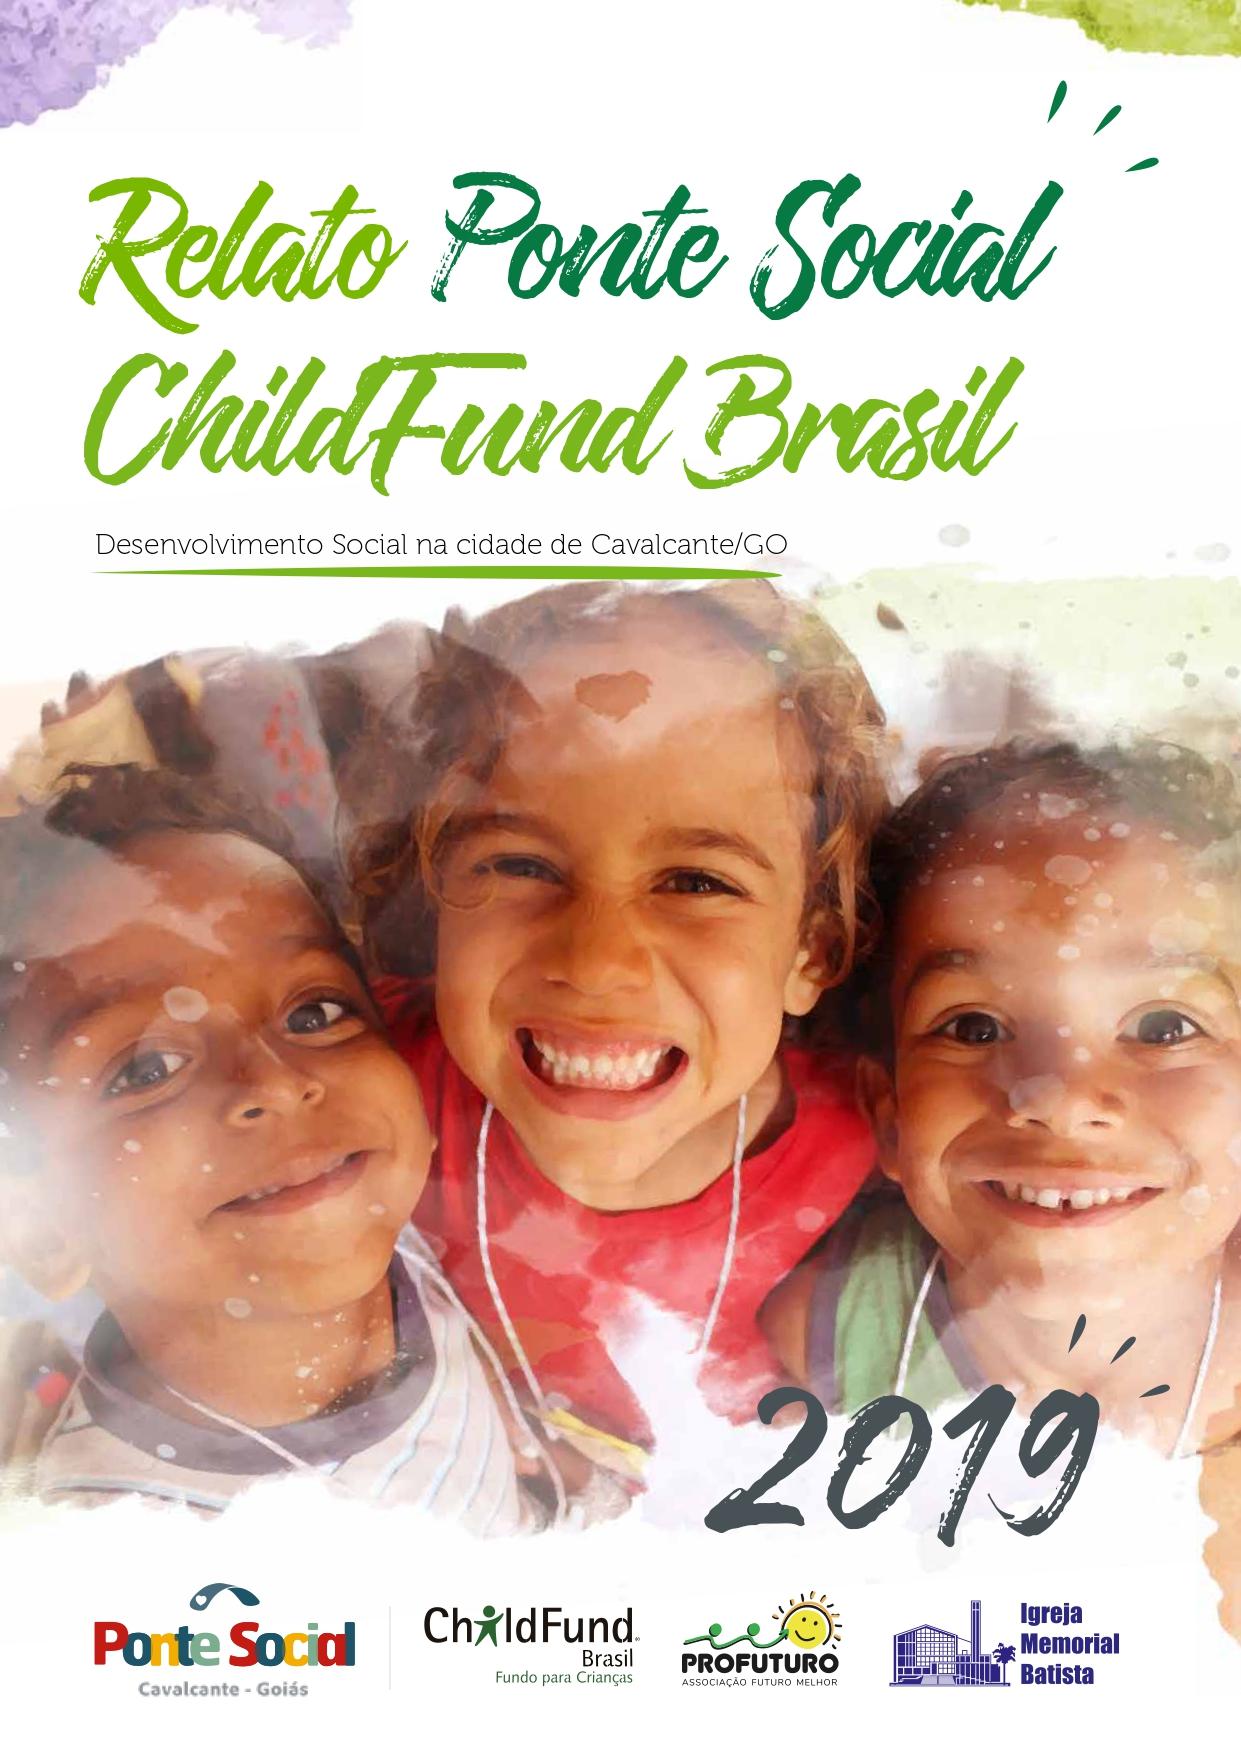 Relato Ponte Social - Cavalcante 2019